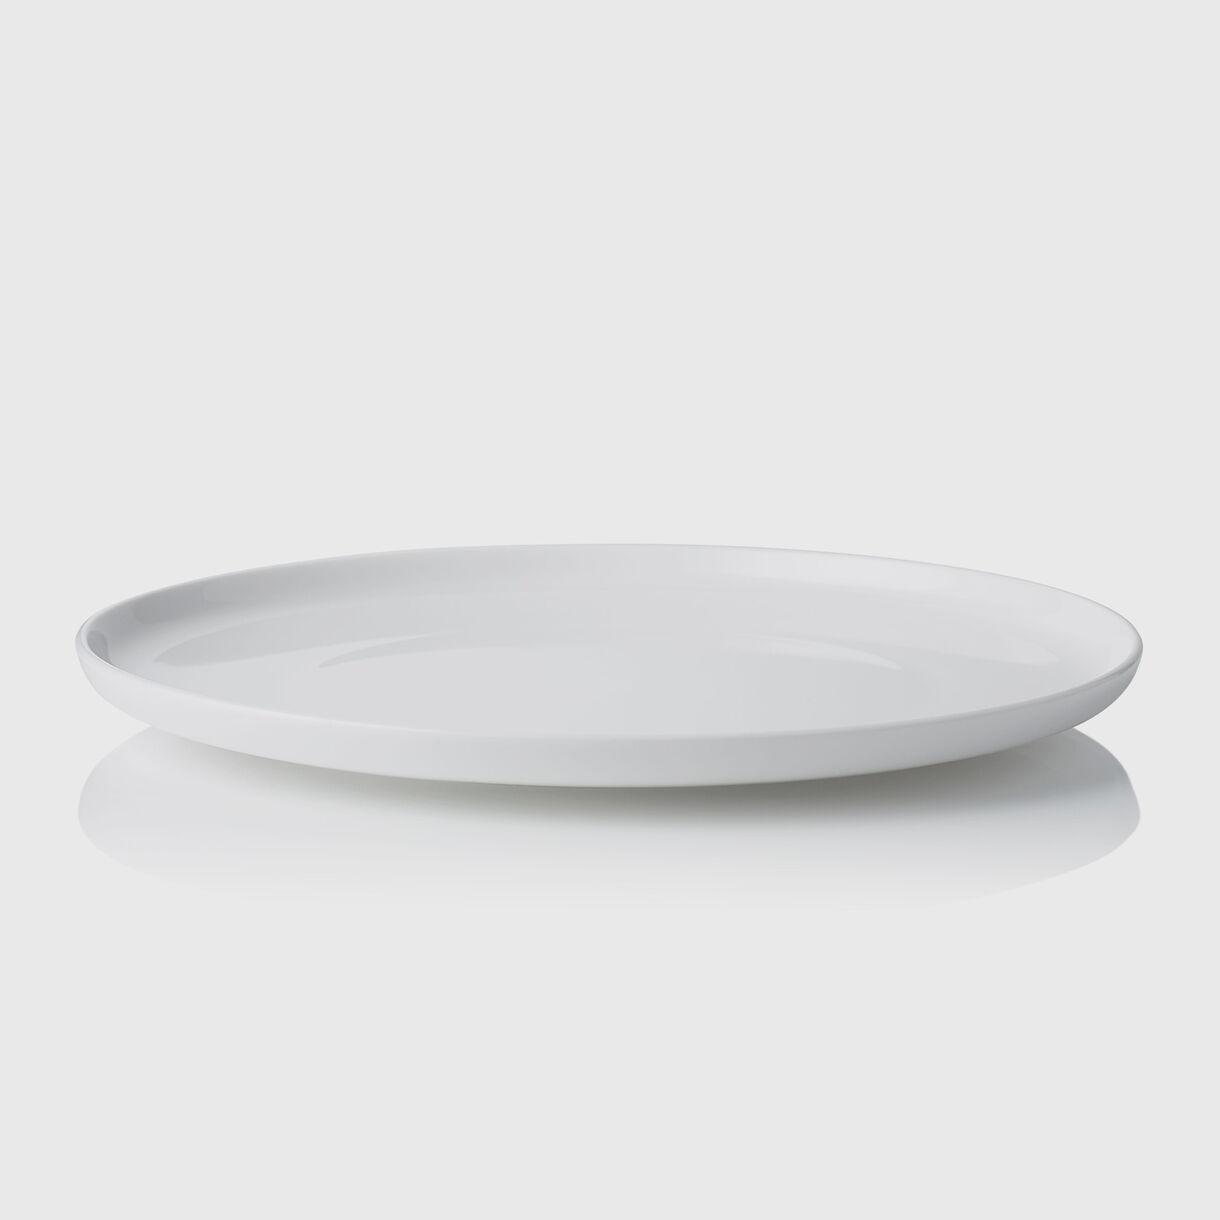 Mark Newson by Noritake Round Serving Platter